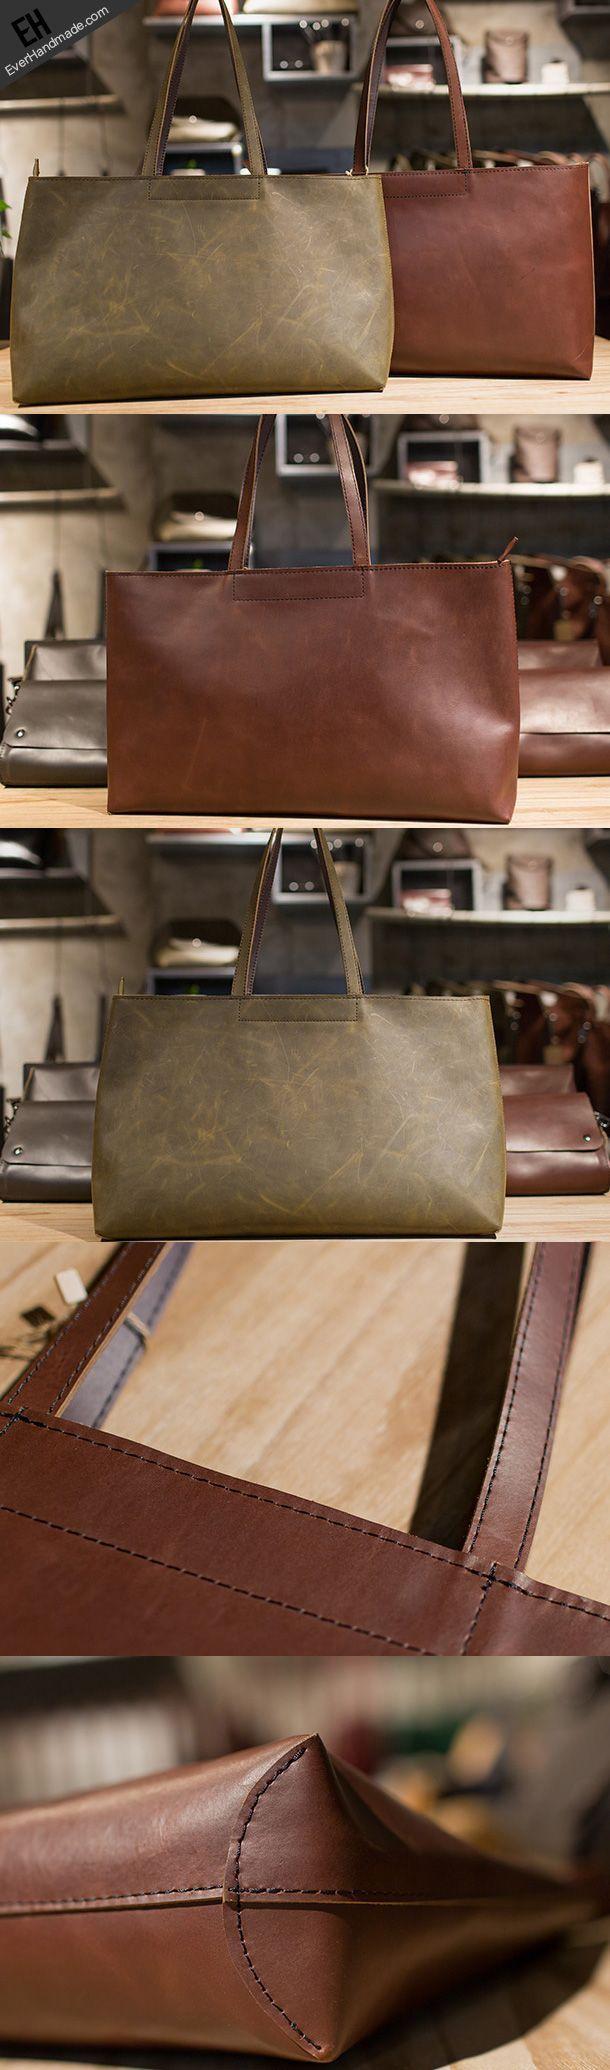 Handmade Leather vintage Big Large tote bag brown coffee for women leather shoulder bag